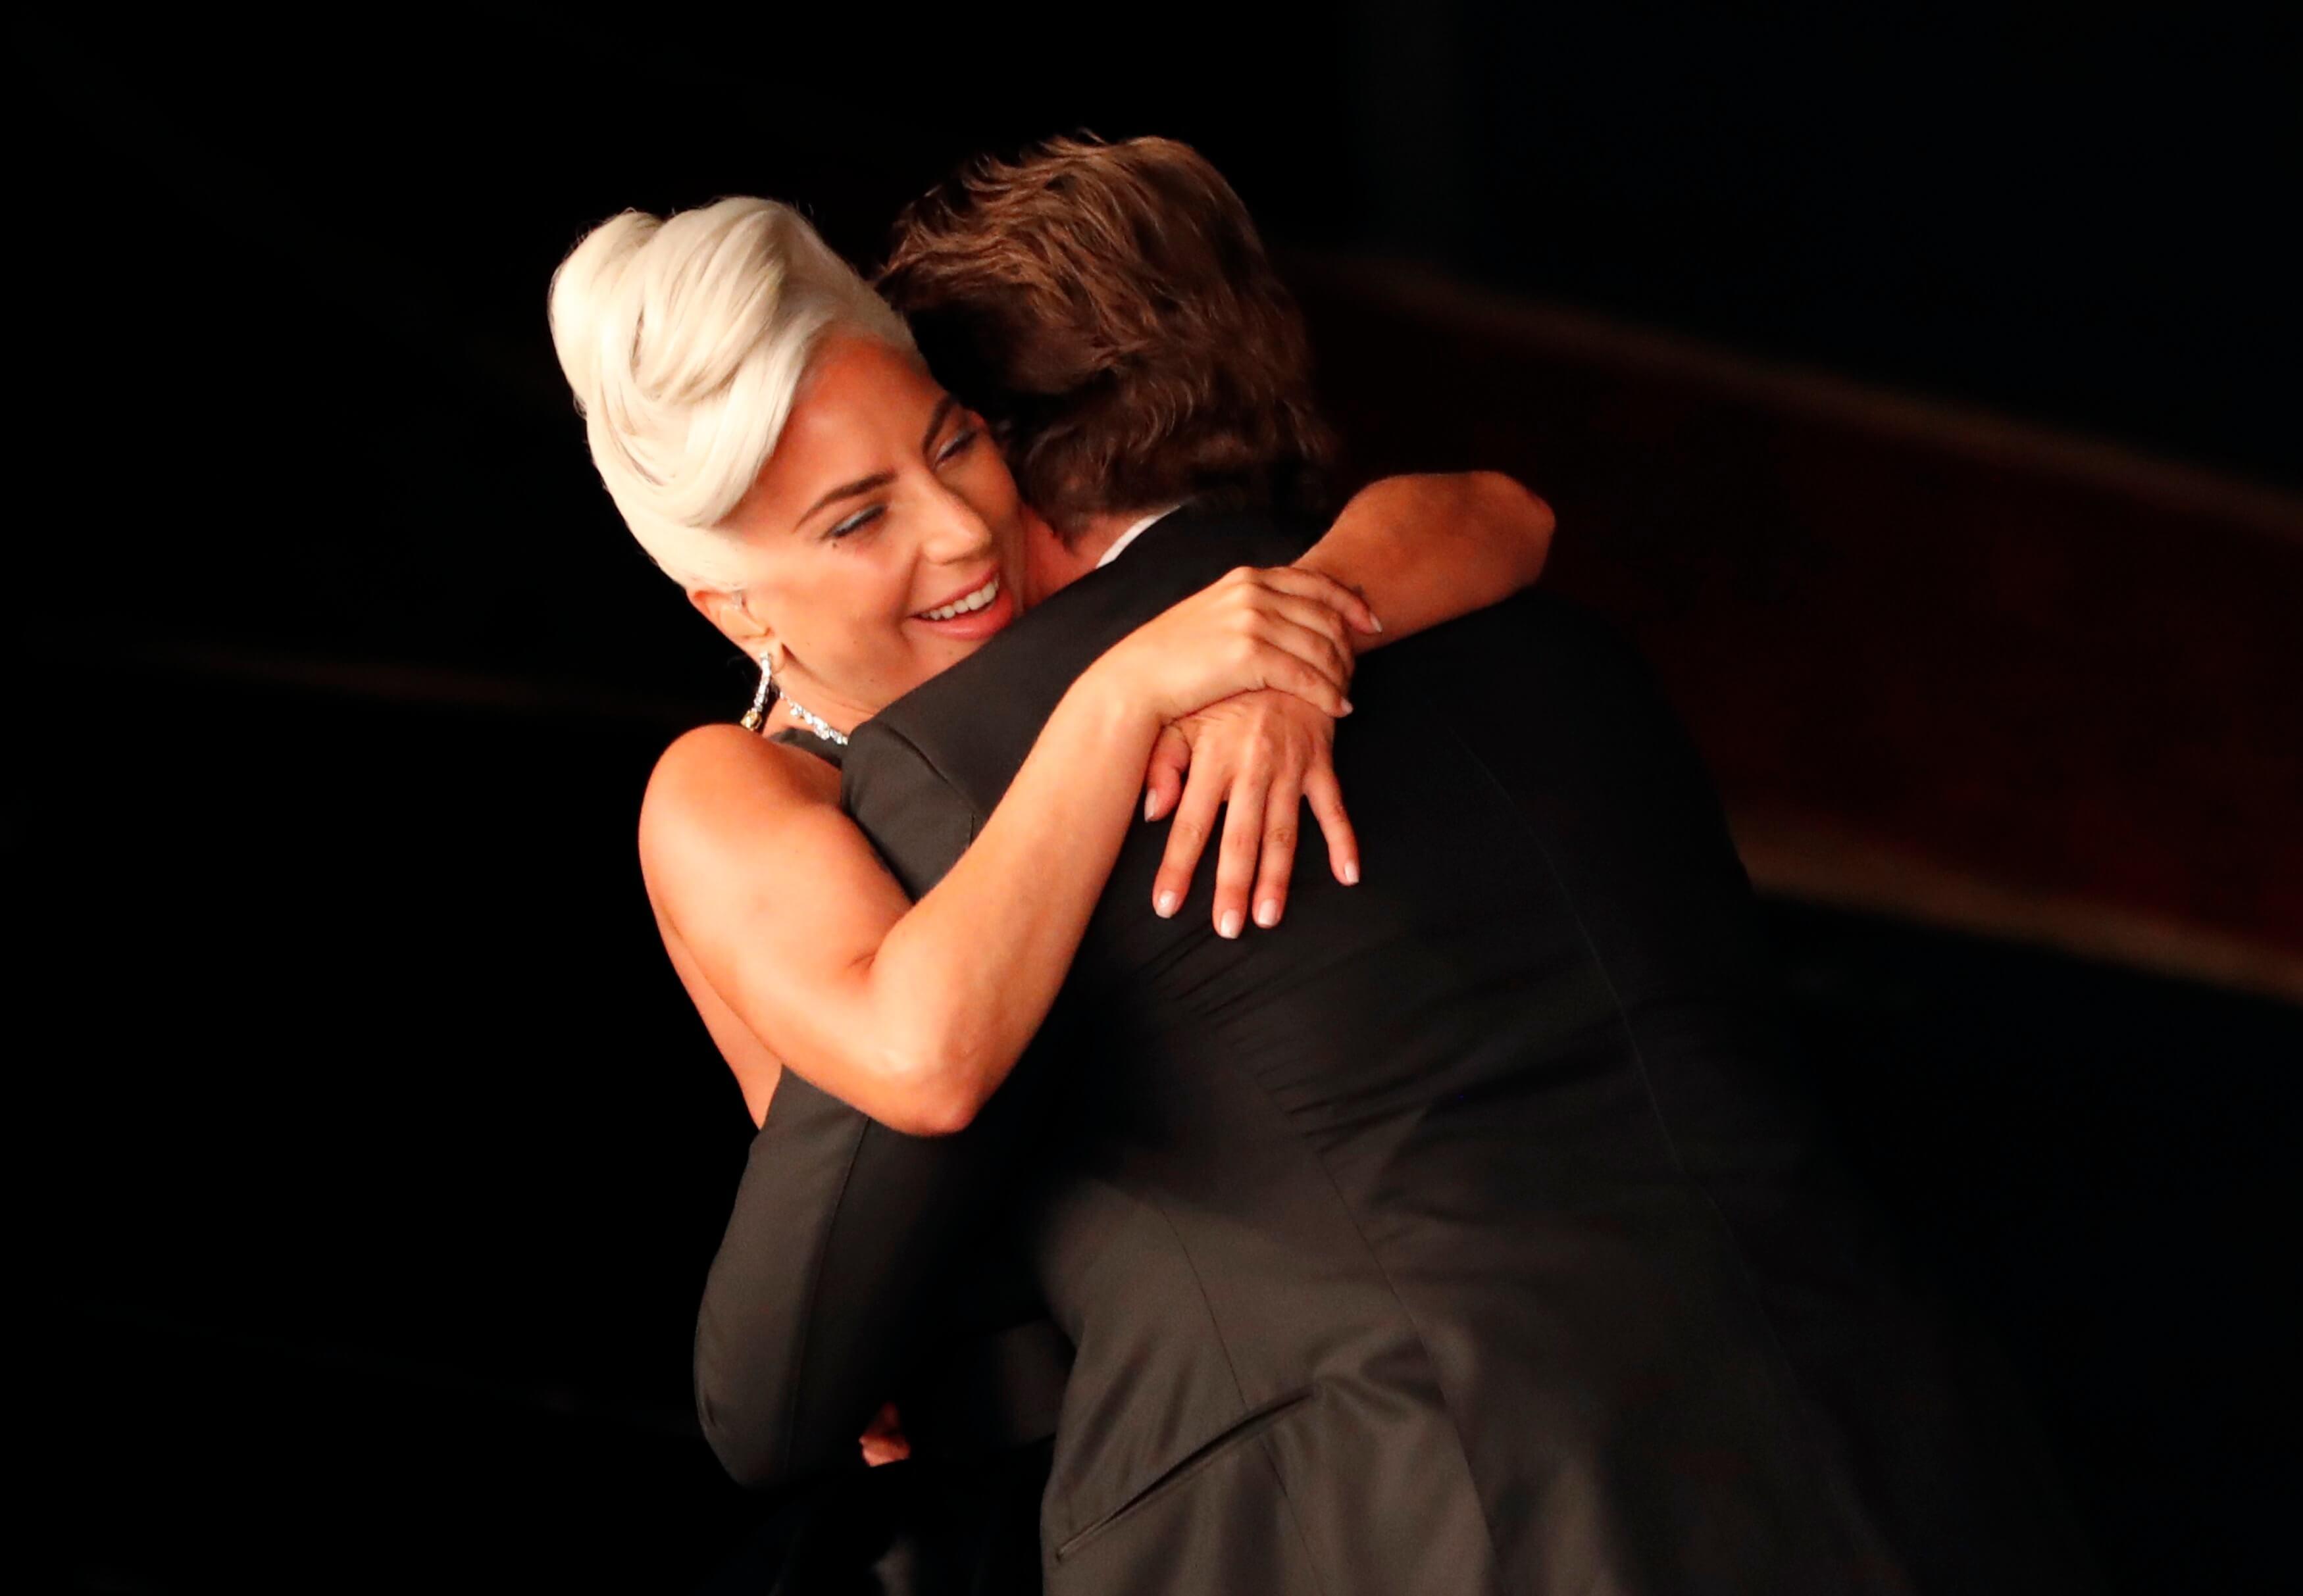 Lady Gaga: Σας δουλεύαμε όλους με τον Μπράντλεϊ Κούπερ